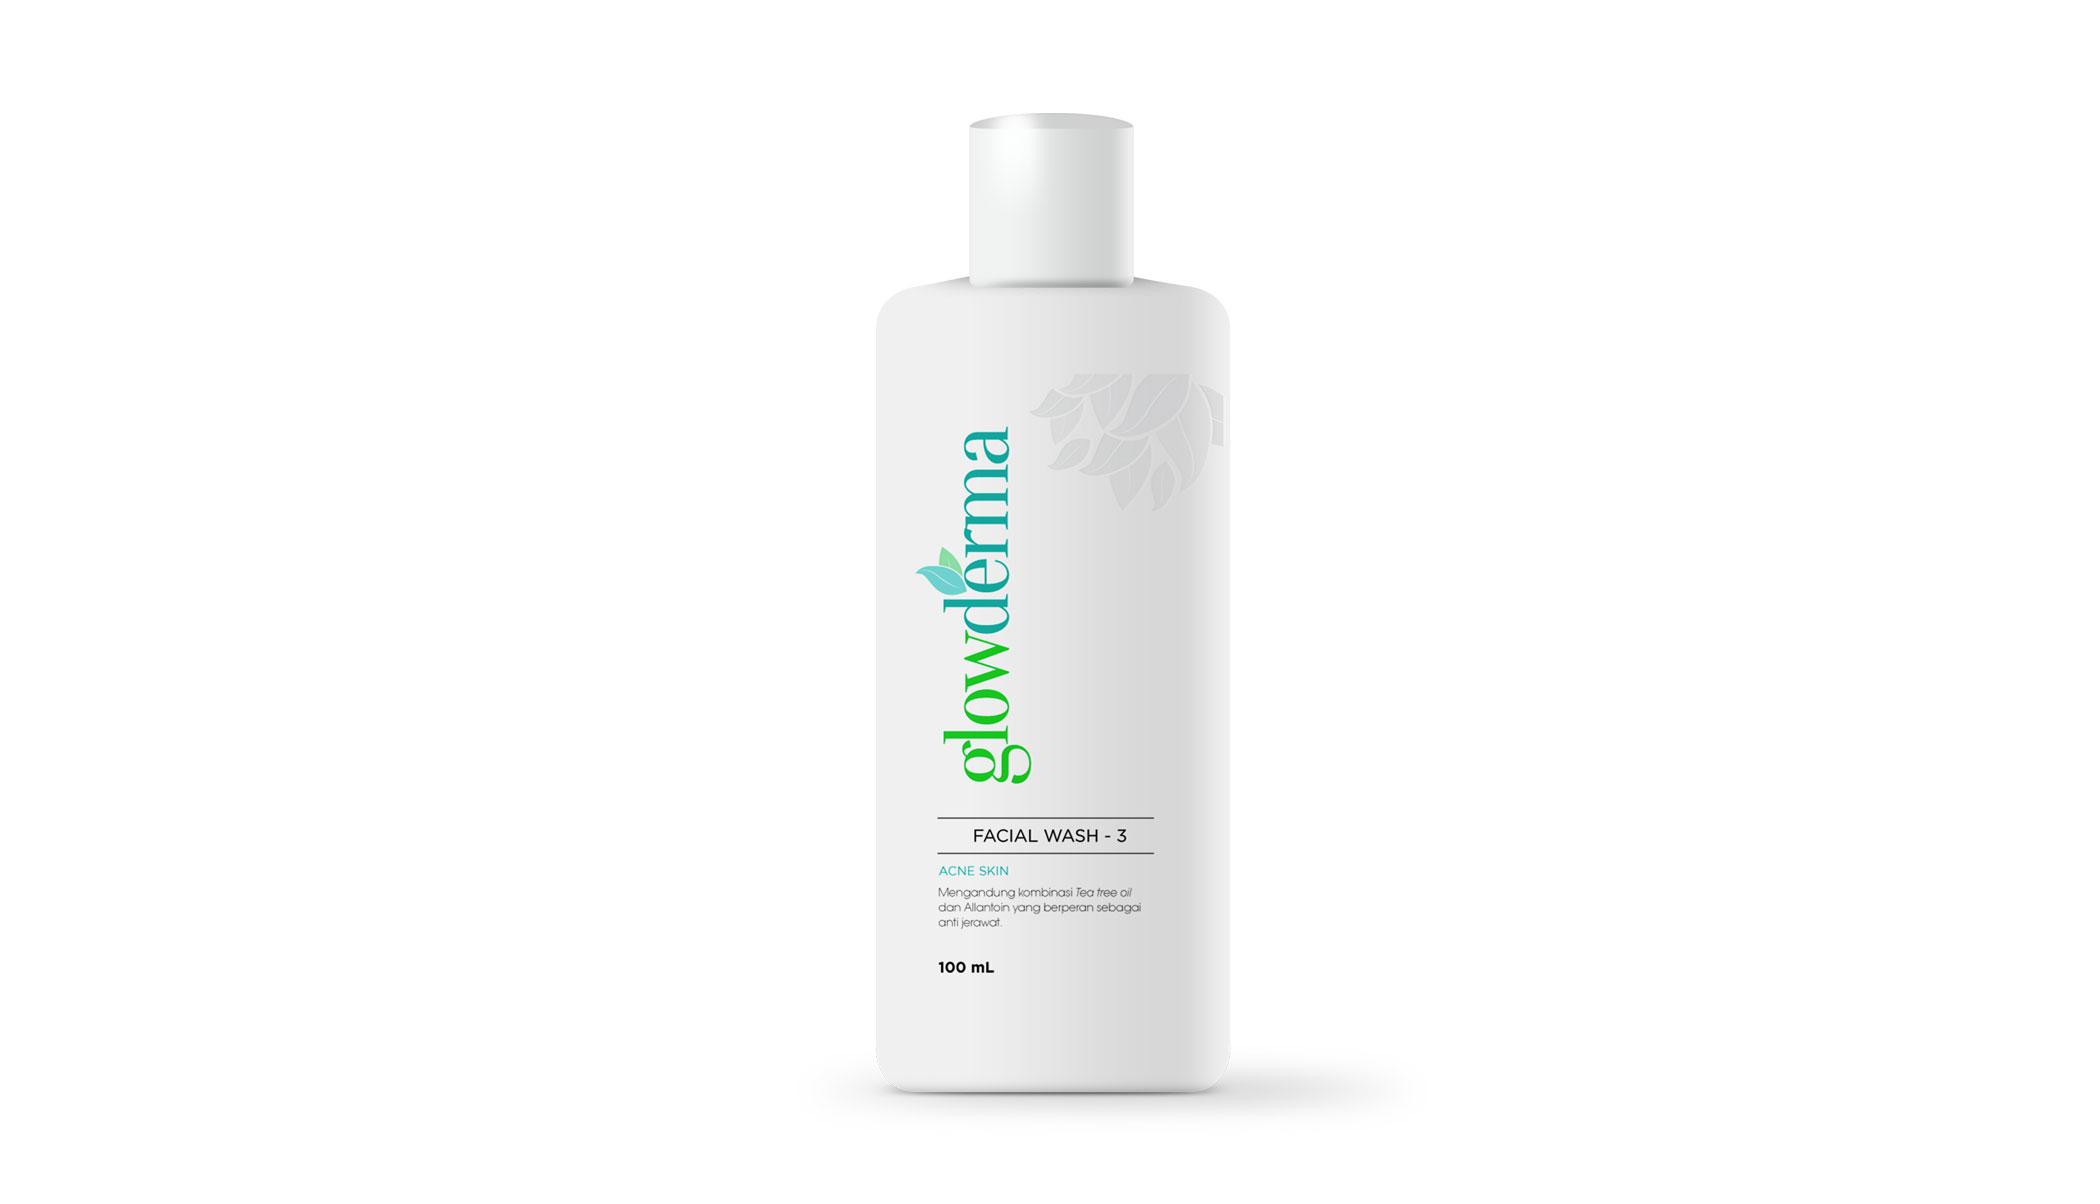 glowderma-clinic-facial-wash-3